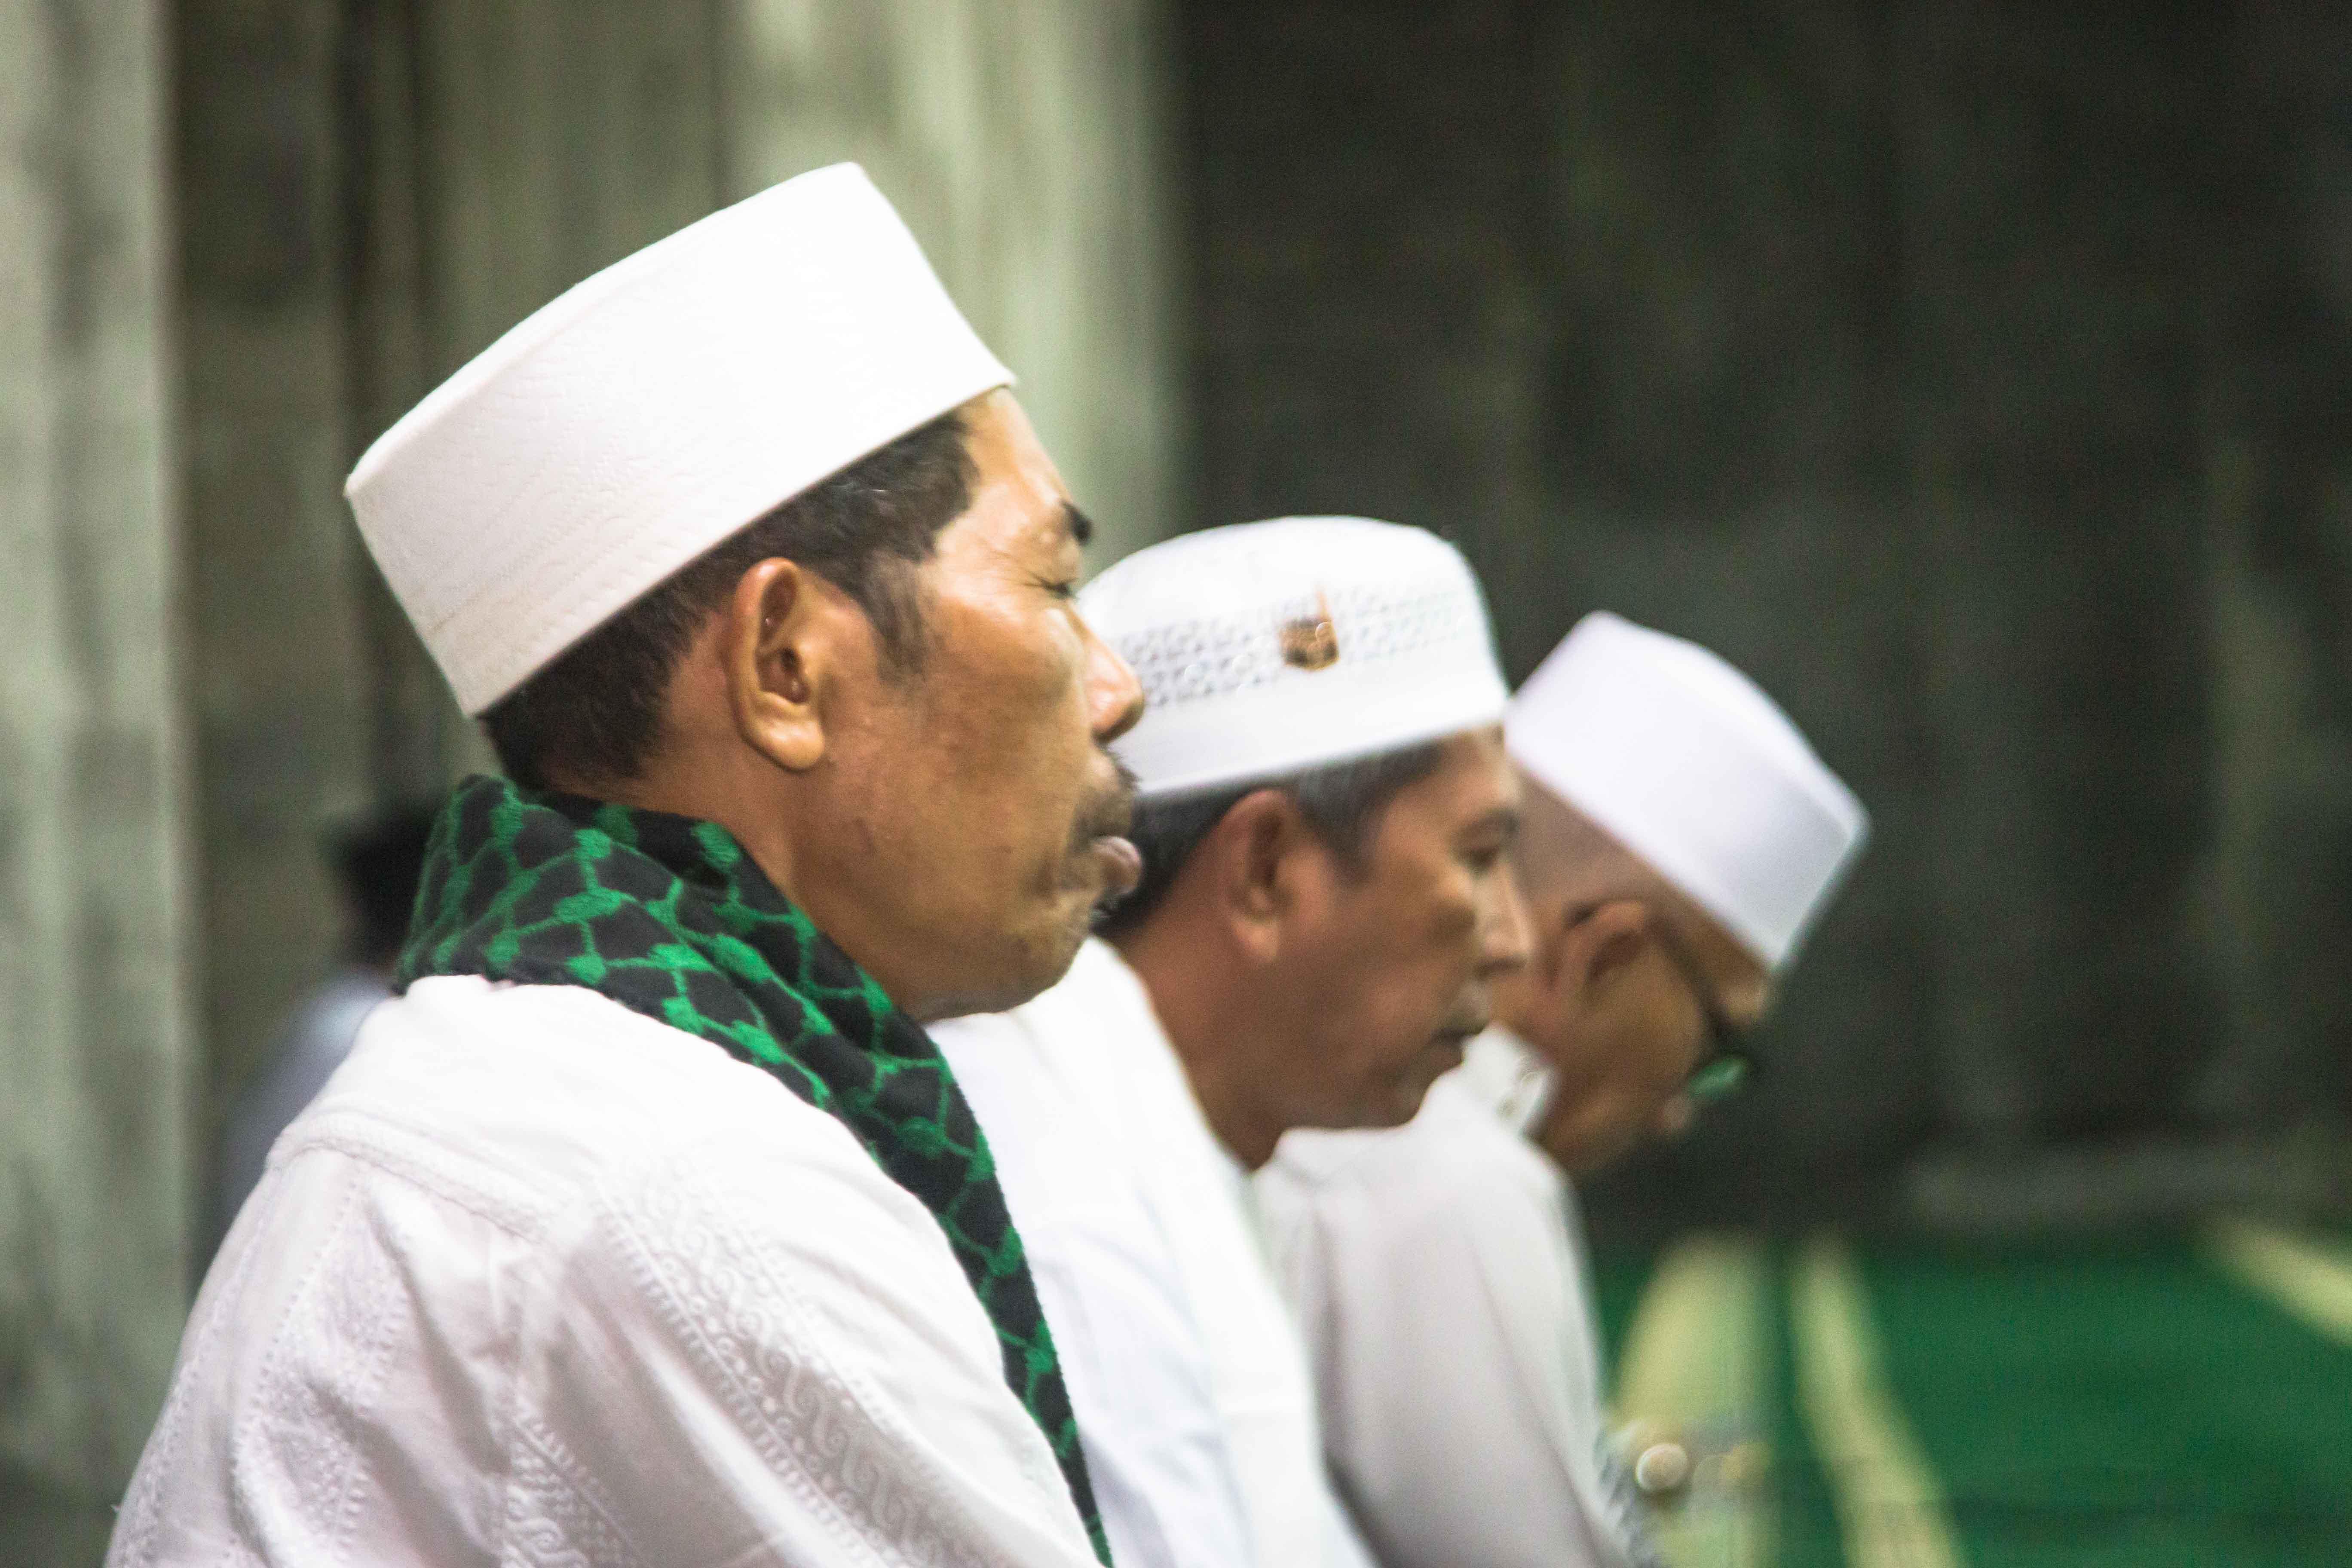 Ketua Sie Bidang Keagamaan